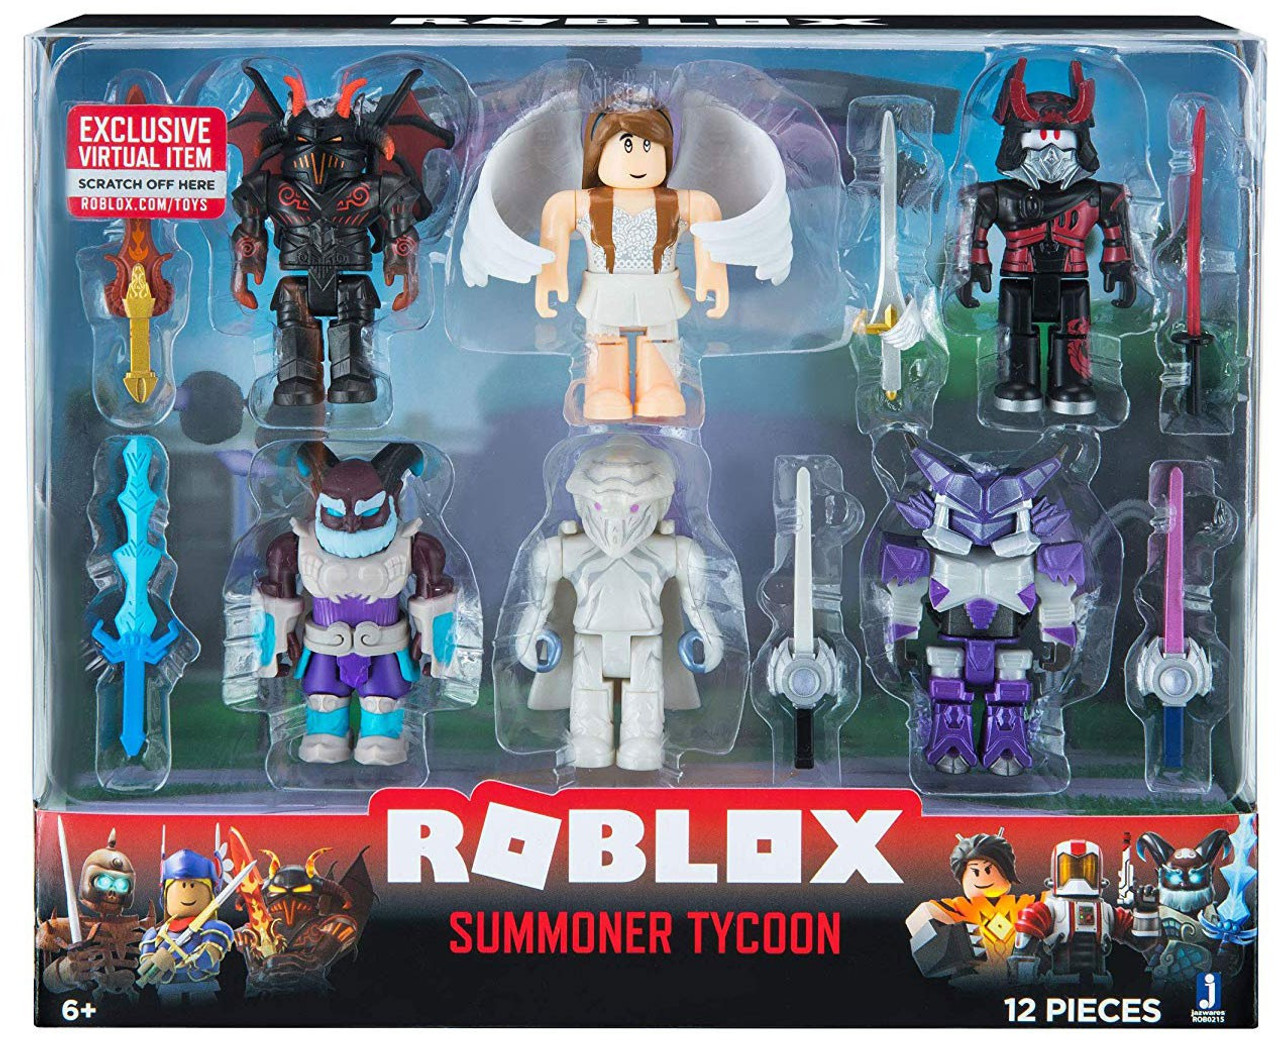 Roblox Mix Match Summoner Tycoon 3 Action Figure 6 Pack Jazwares